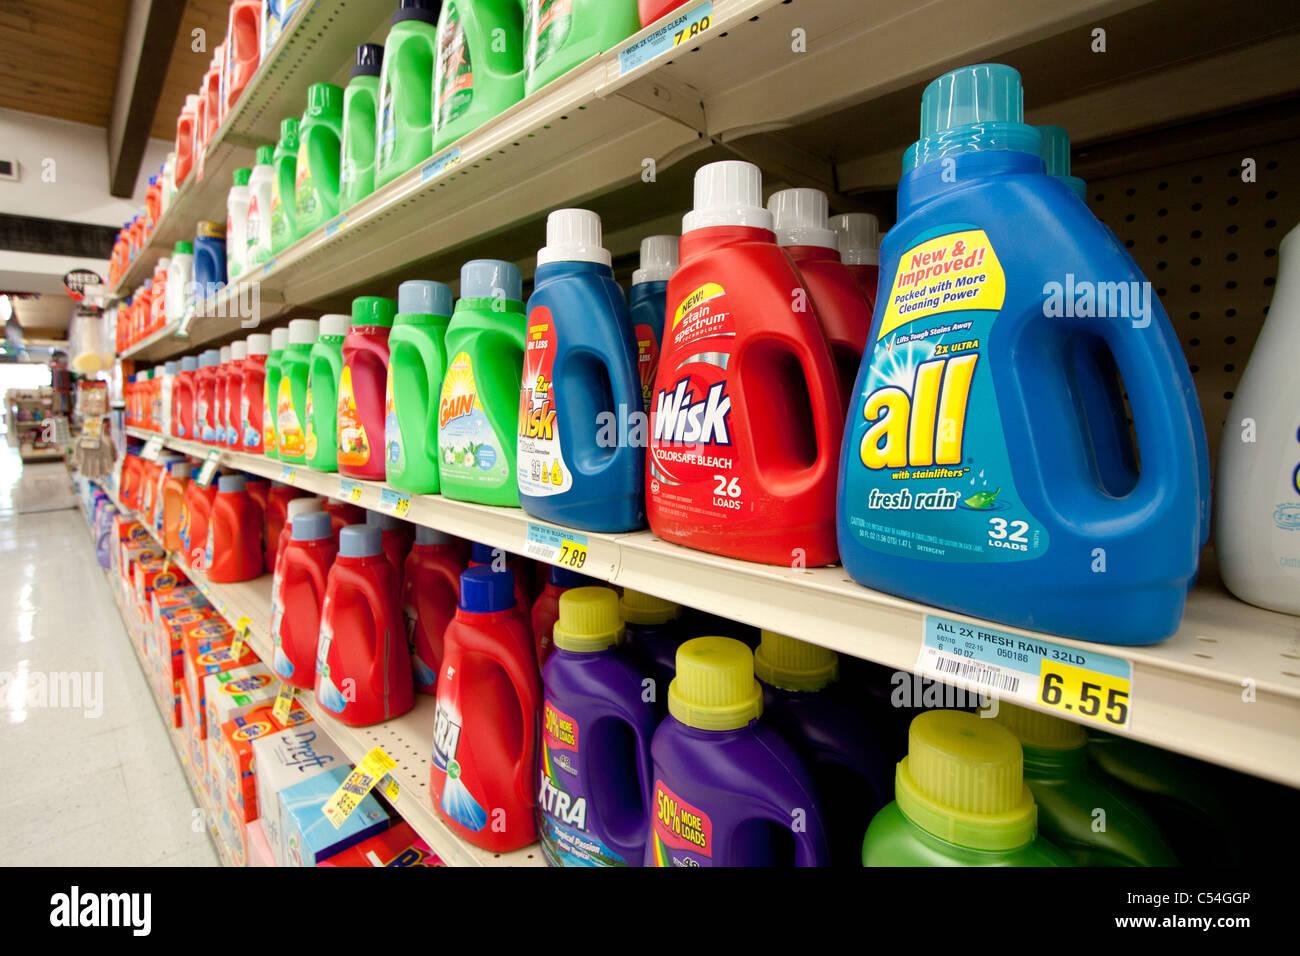 Clothes washing detergent for sale in Kearney, Nebraska, USA. - Stock Image